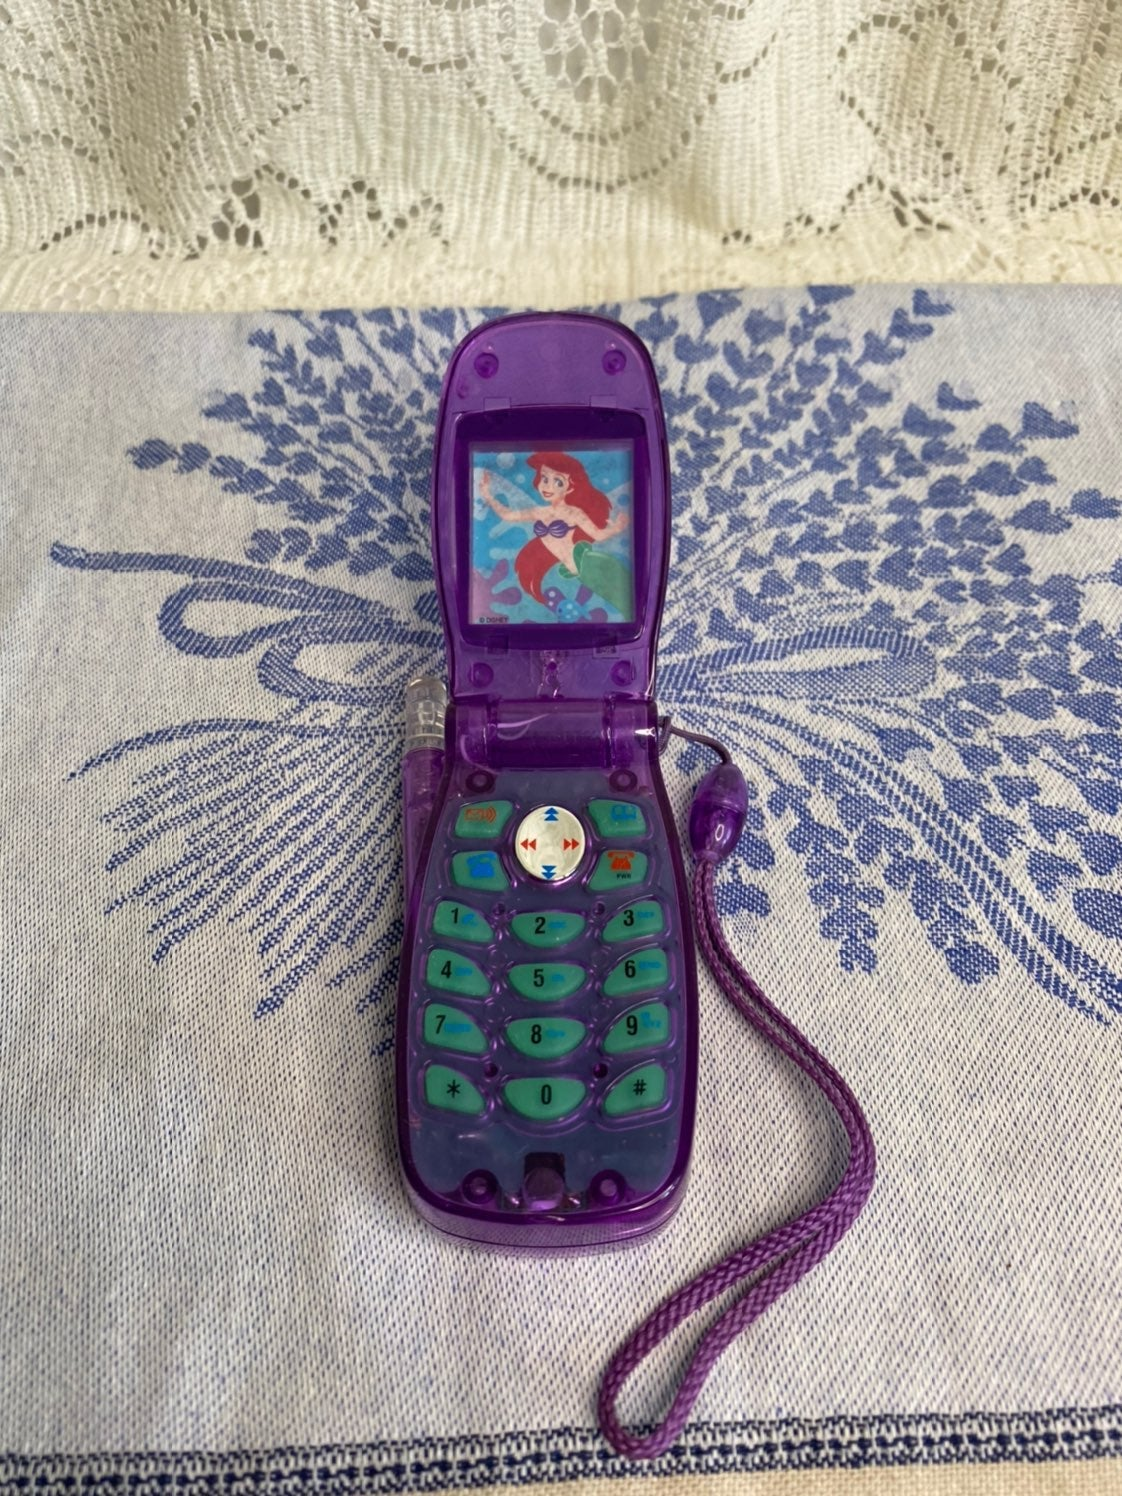 Toy phone- Disney Ariel- with sound